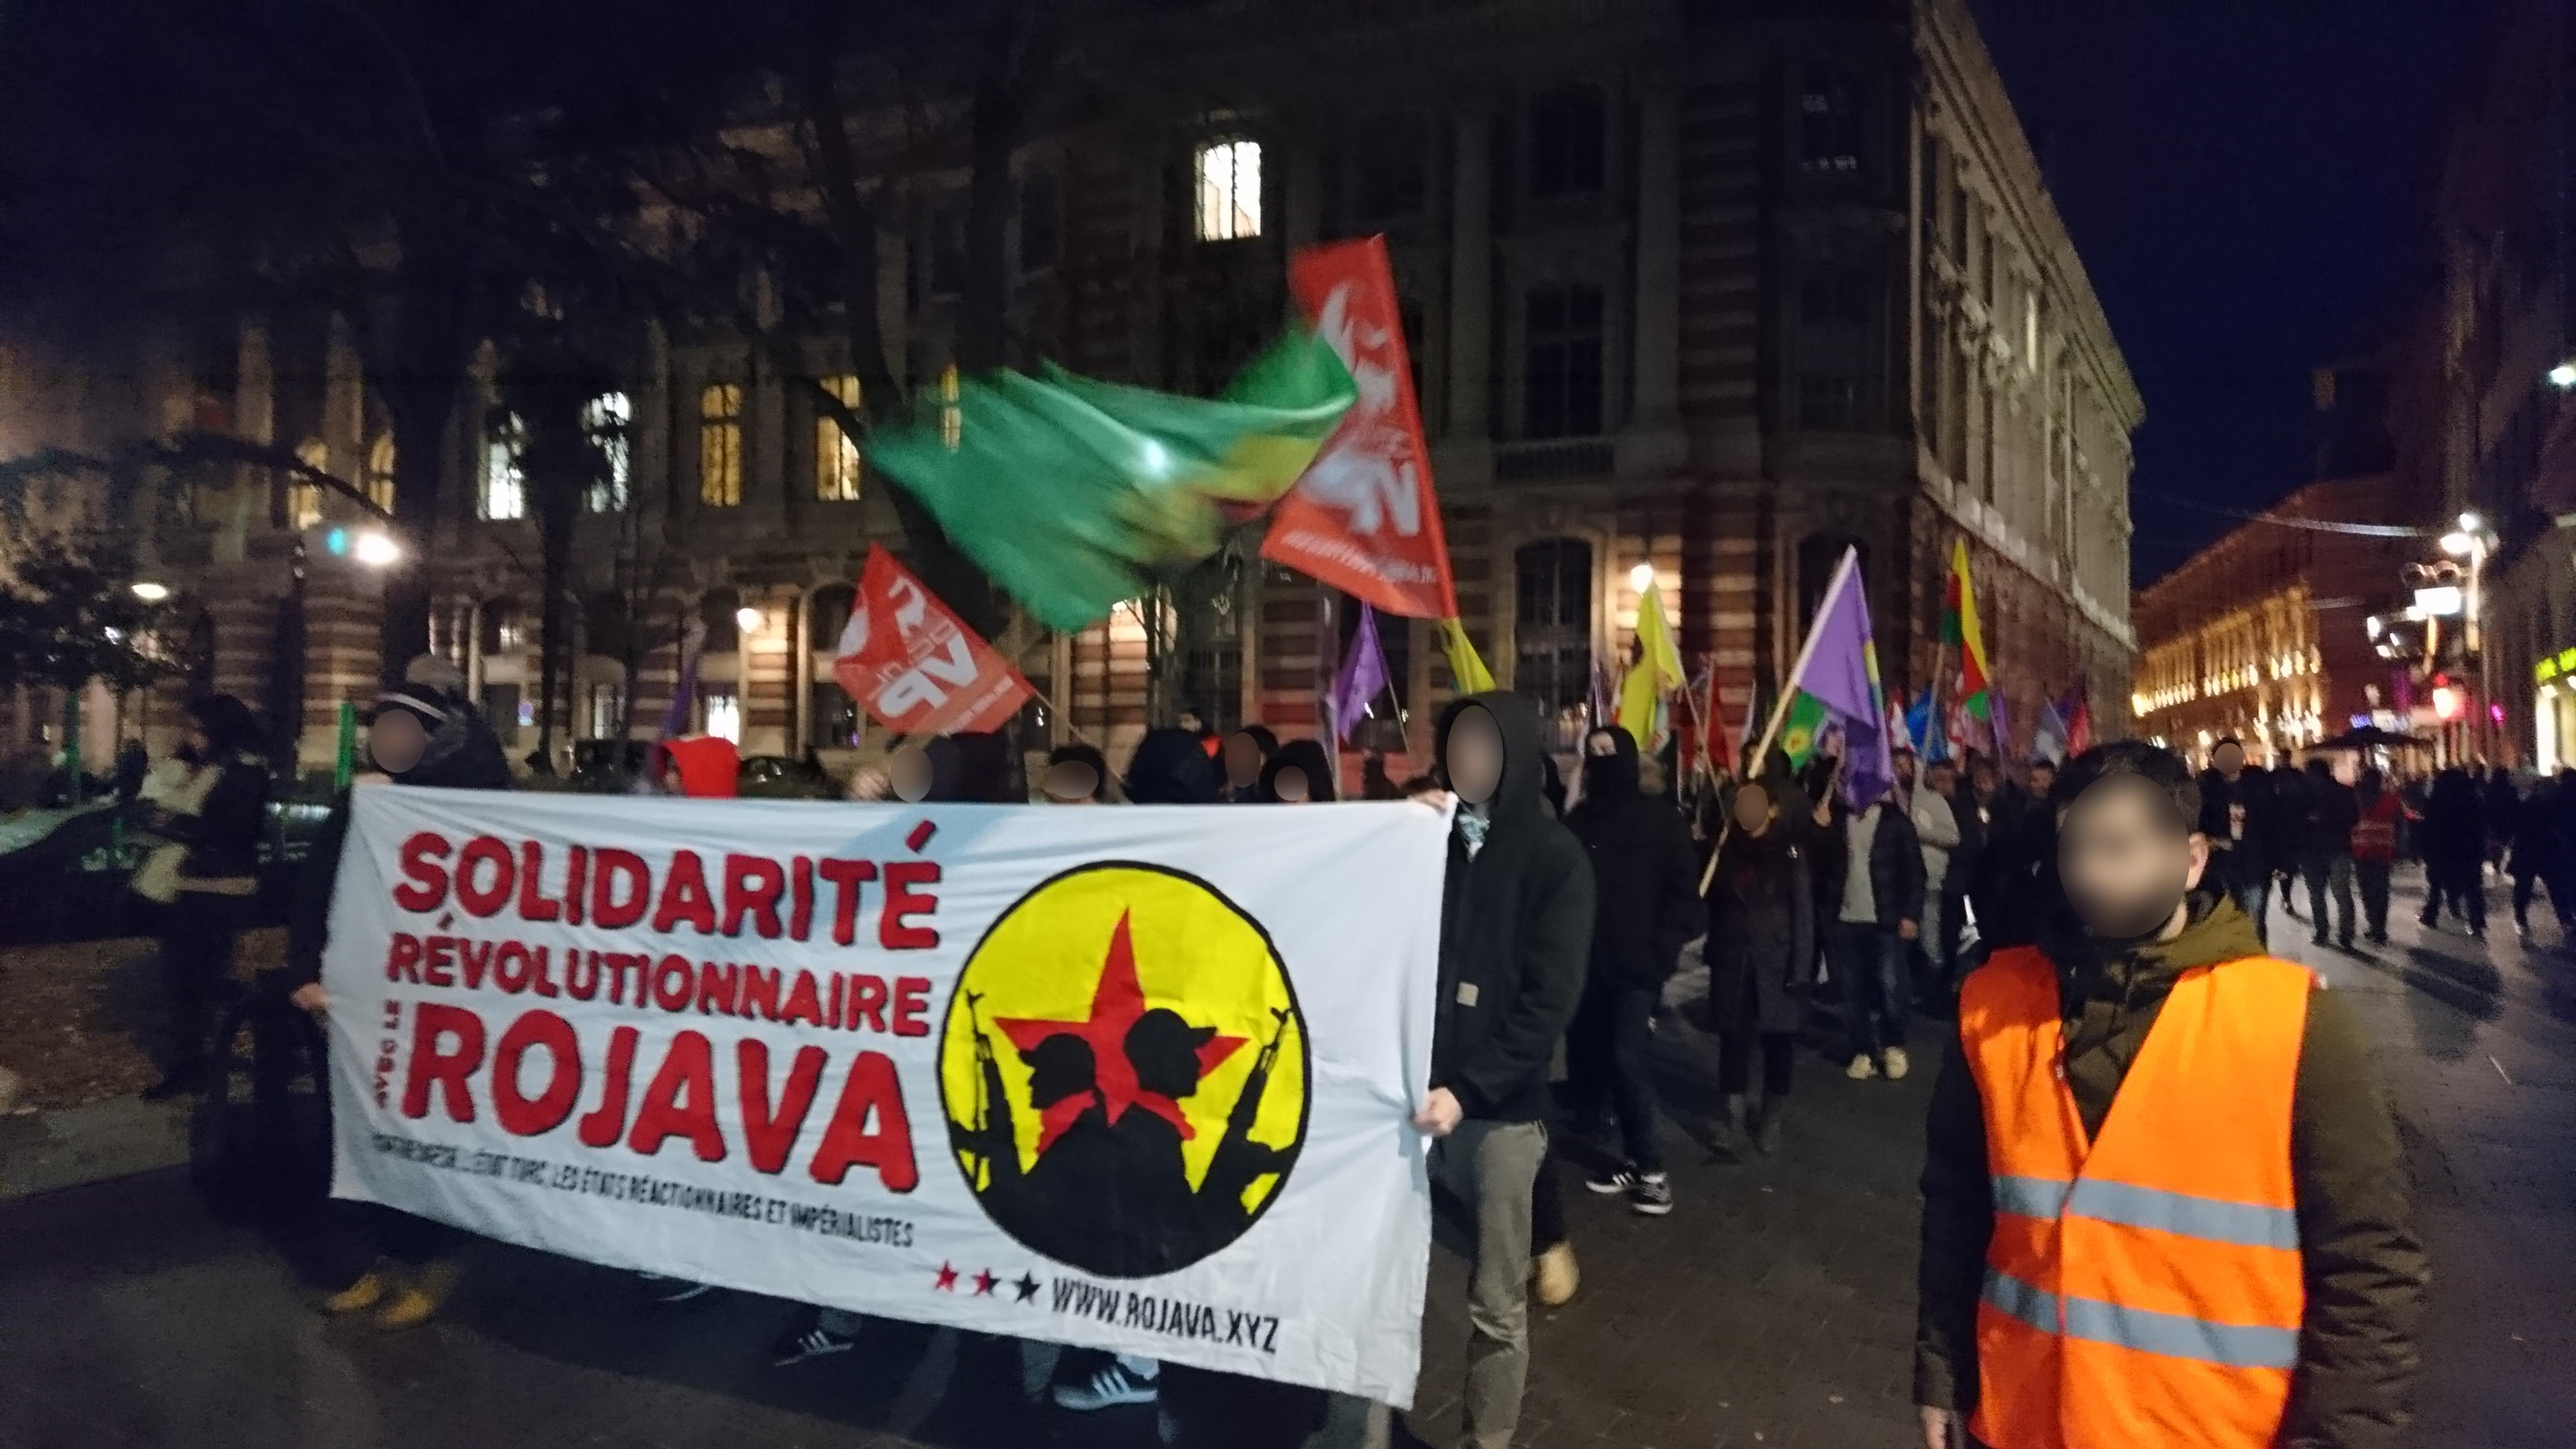 bataillon_international_de_liberation_toulouse.jpg